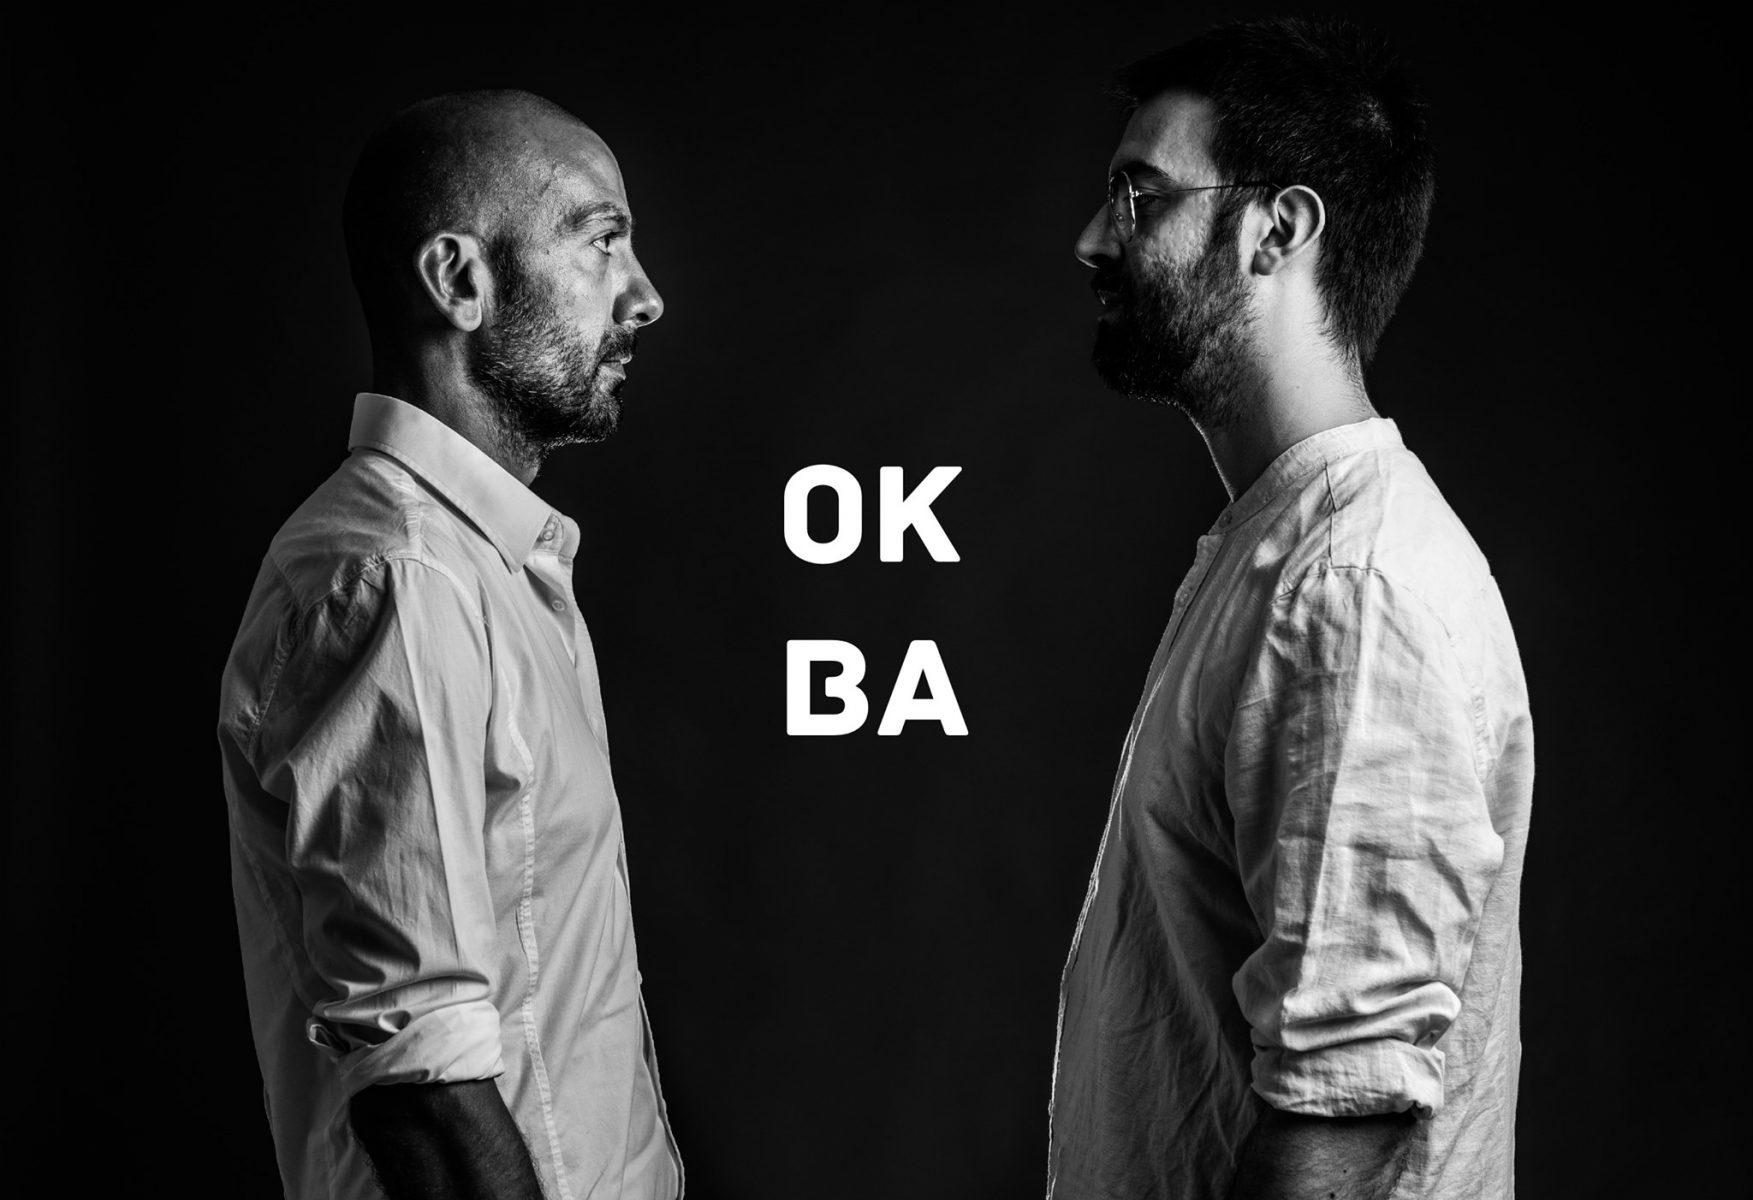 Fuzzbeat - Ok Ba - Pasquale Demis Posadinu - Alberto Atzori - Tropical American Bar - Porto Torres - 7 marzo 2020 - eventi - 2020 - Sa Scena Sarda